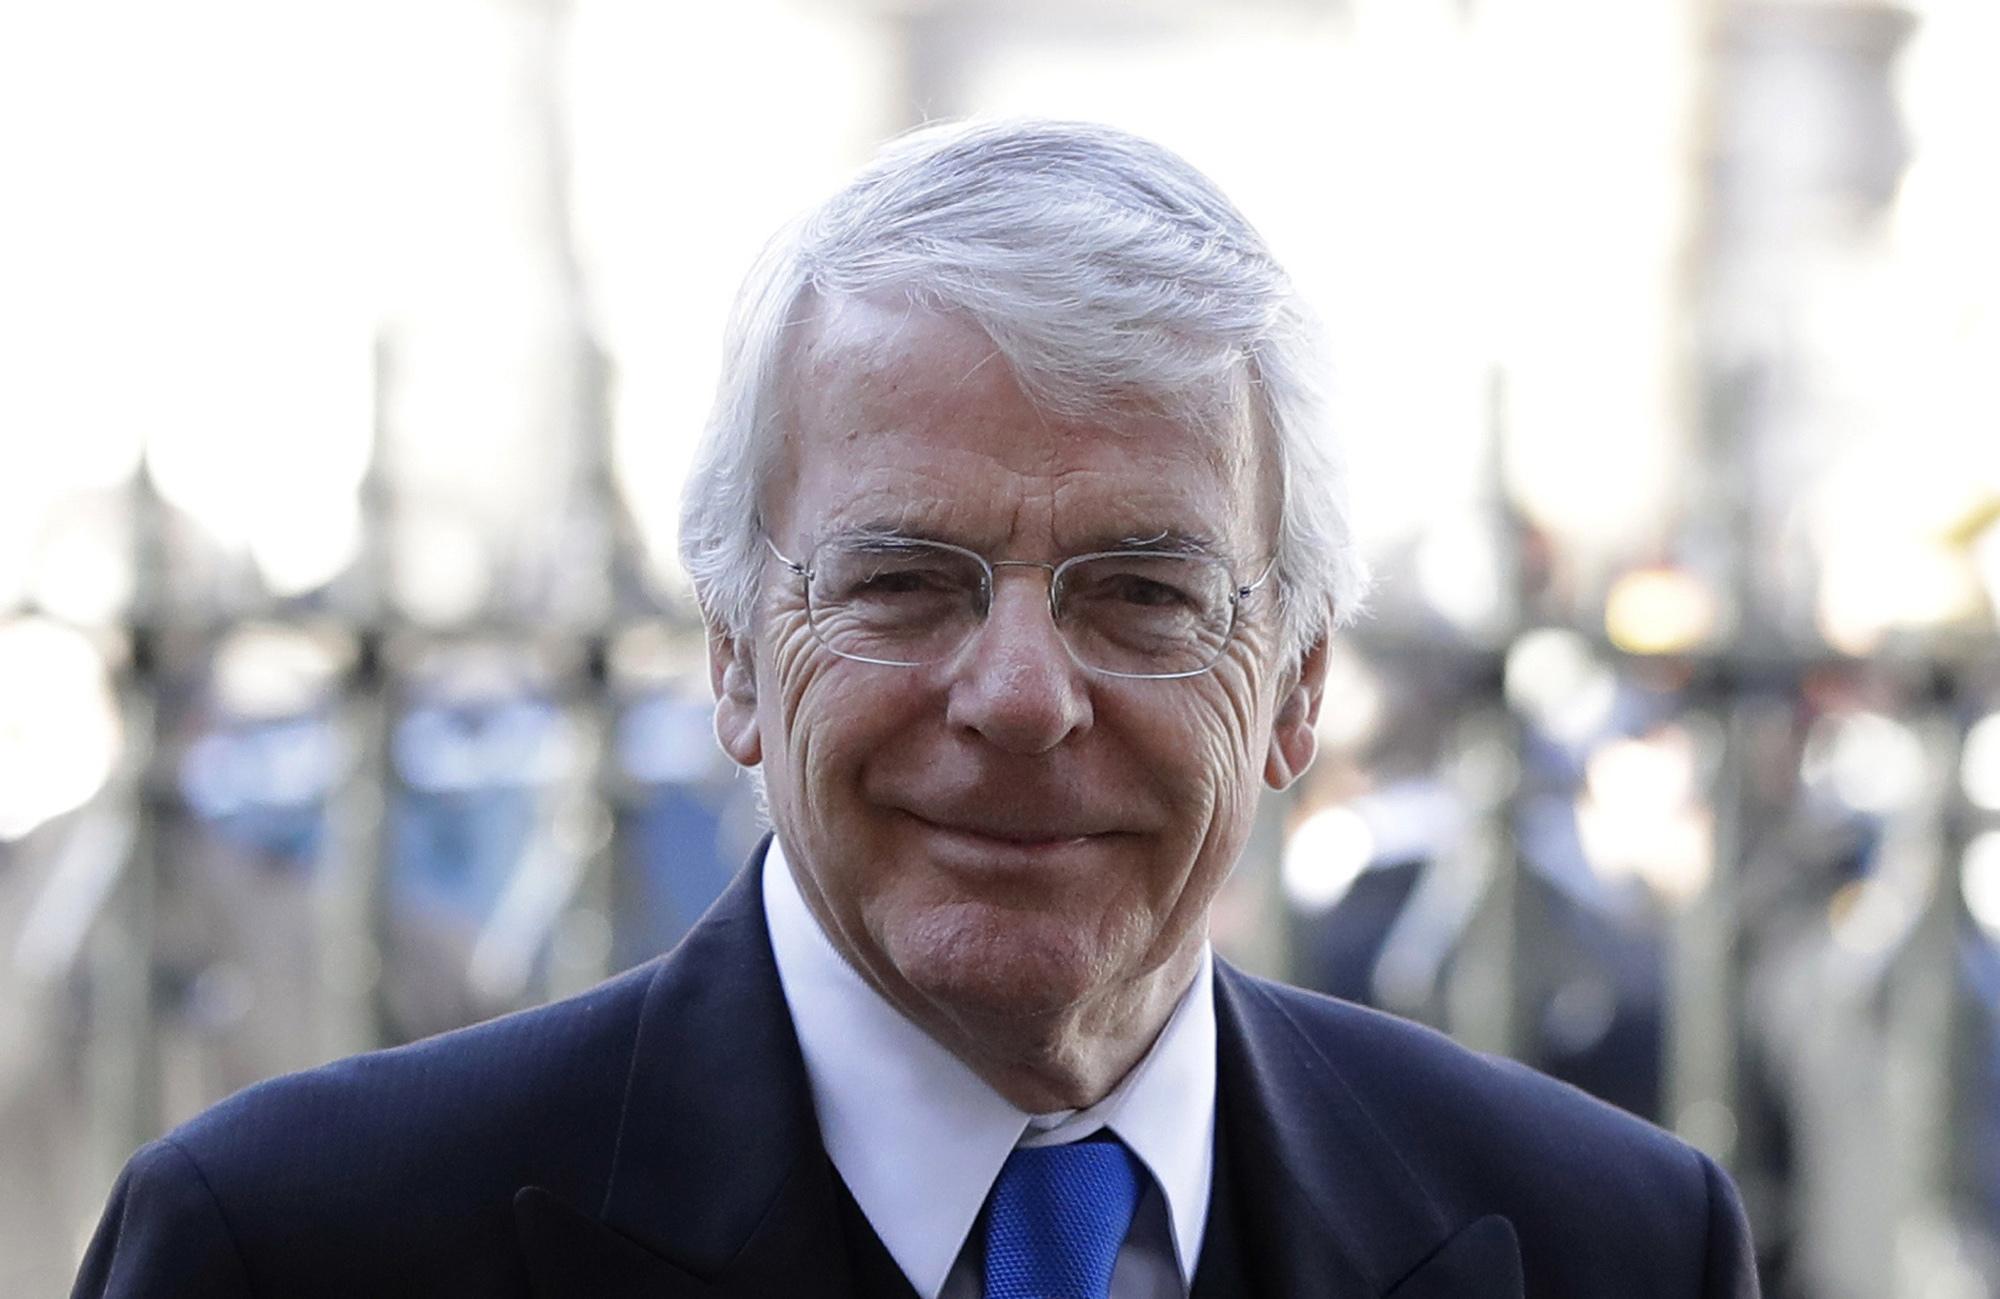 Brexit: Ex-PM vows legal action if UK Parliament suspended